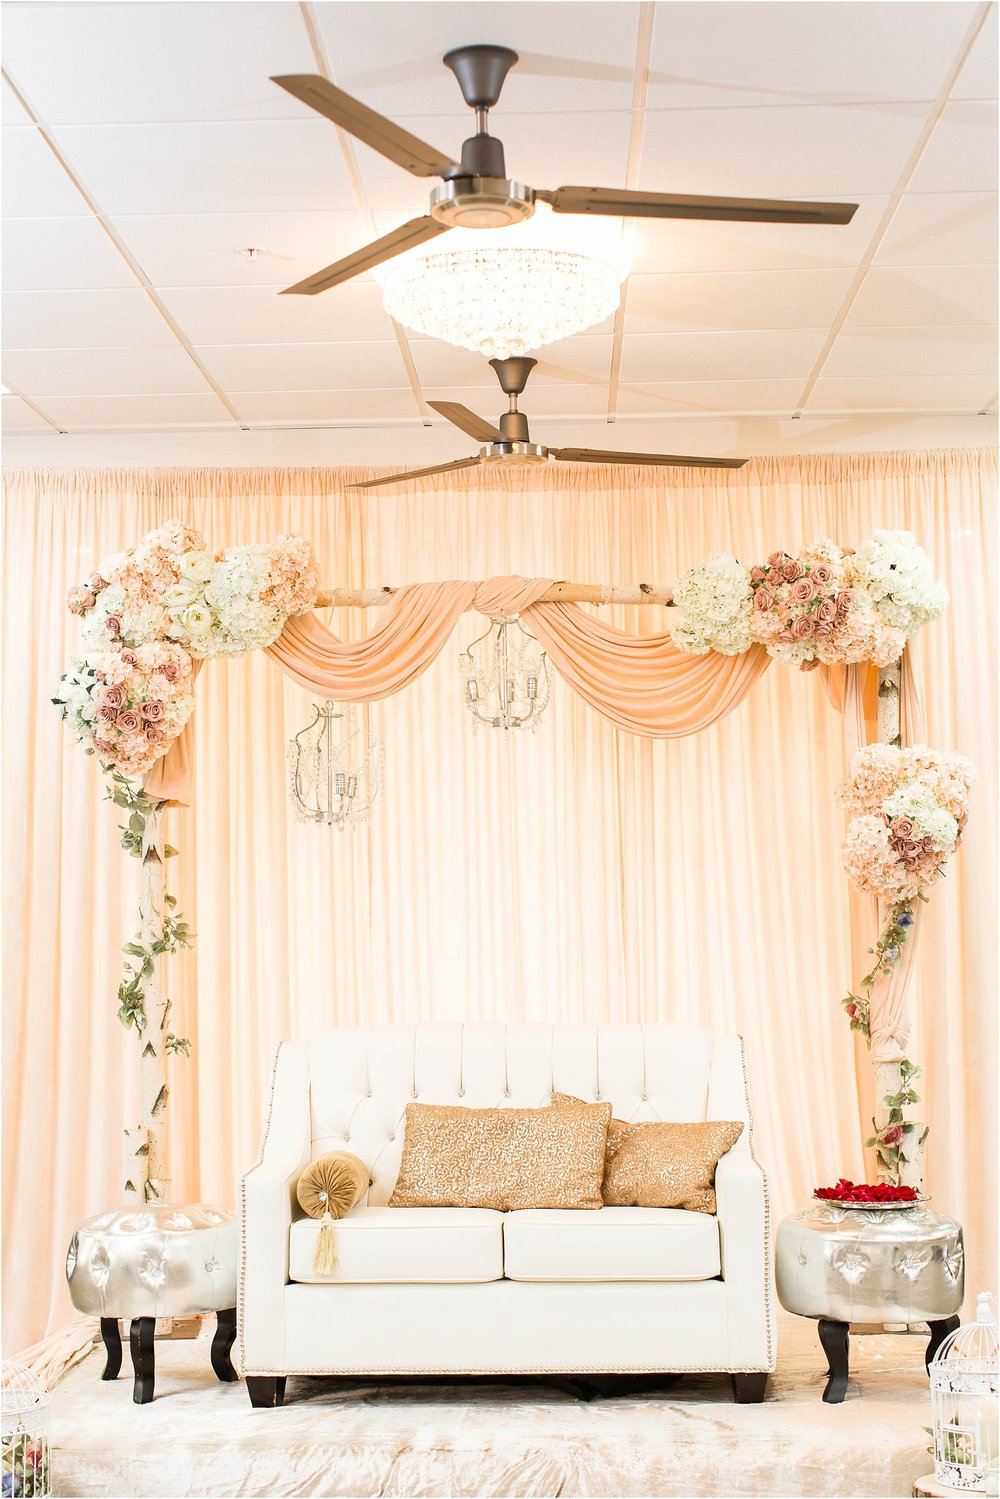 Jame-Masjid-Coopers-Mosque-Kariya-Park-Cherry-Blossoms-Wedding-Toronto-Mississauga-Brampton-Scarborough-GTA-Pakistani-Indian-Wedding-Engagement-Photographer-Photography_0071.jpg